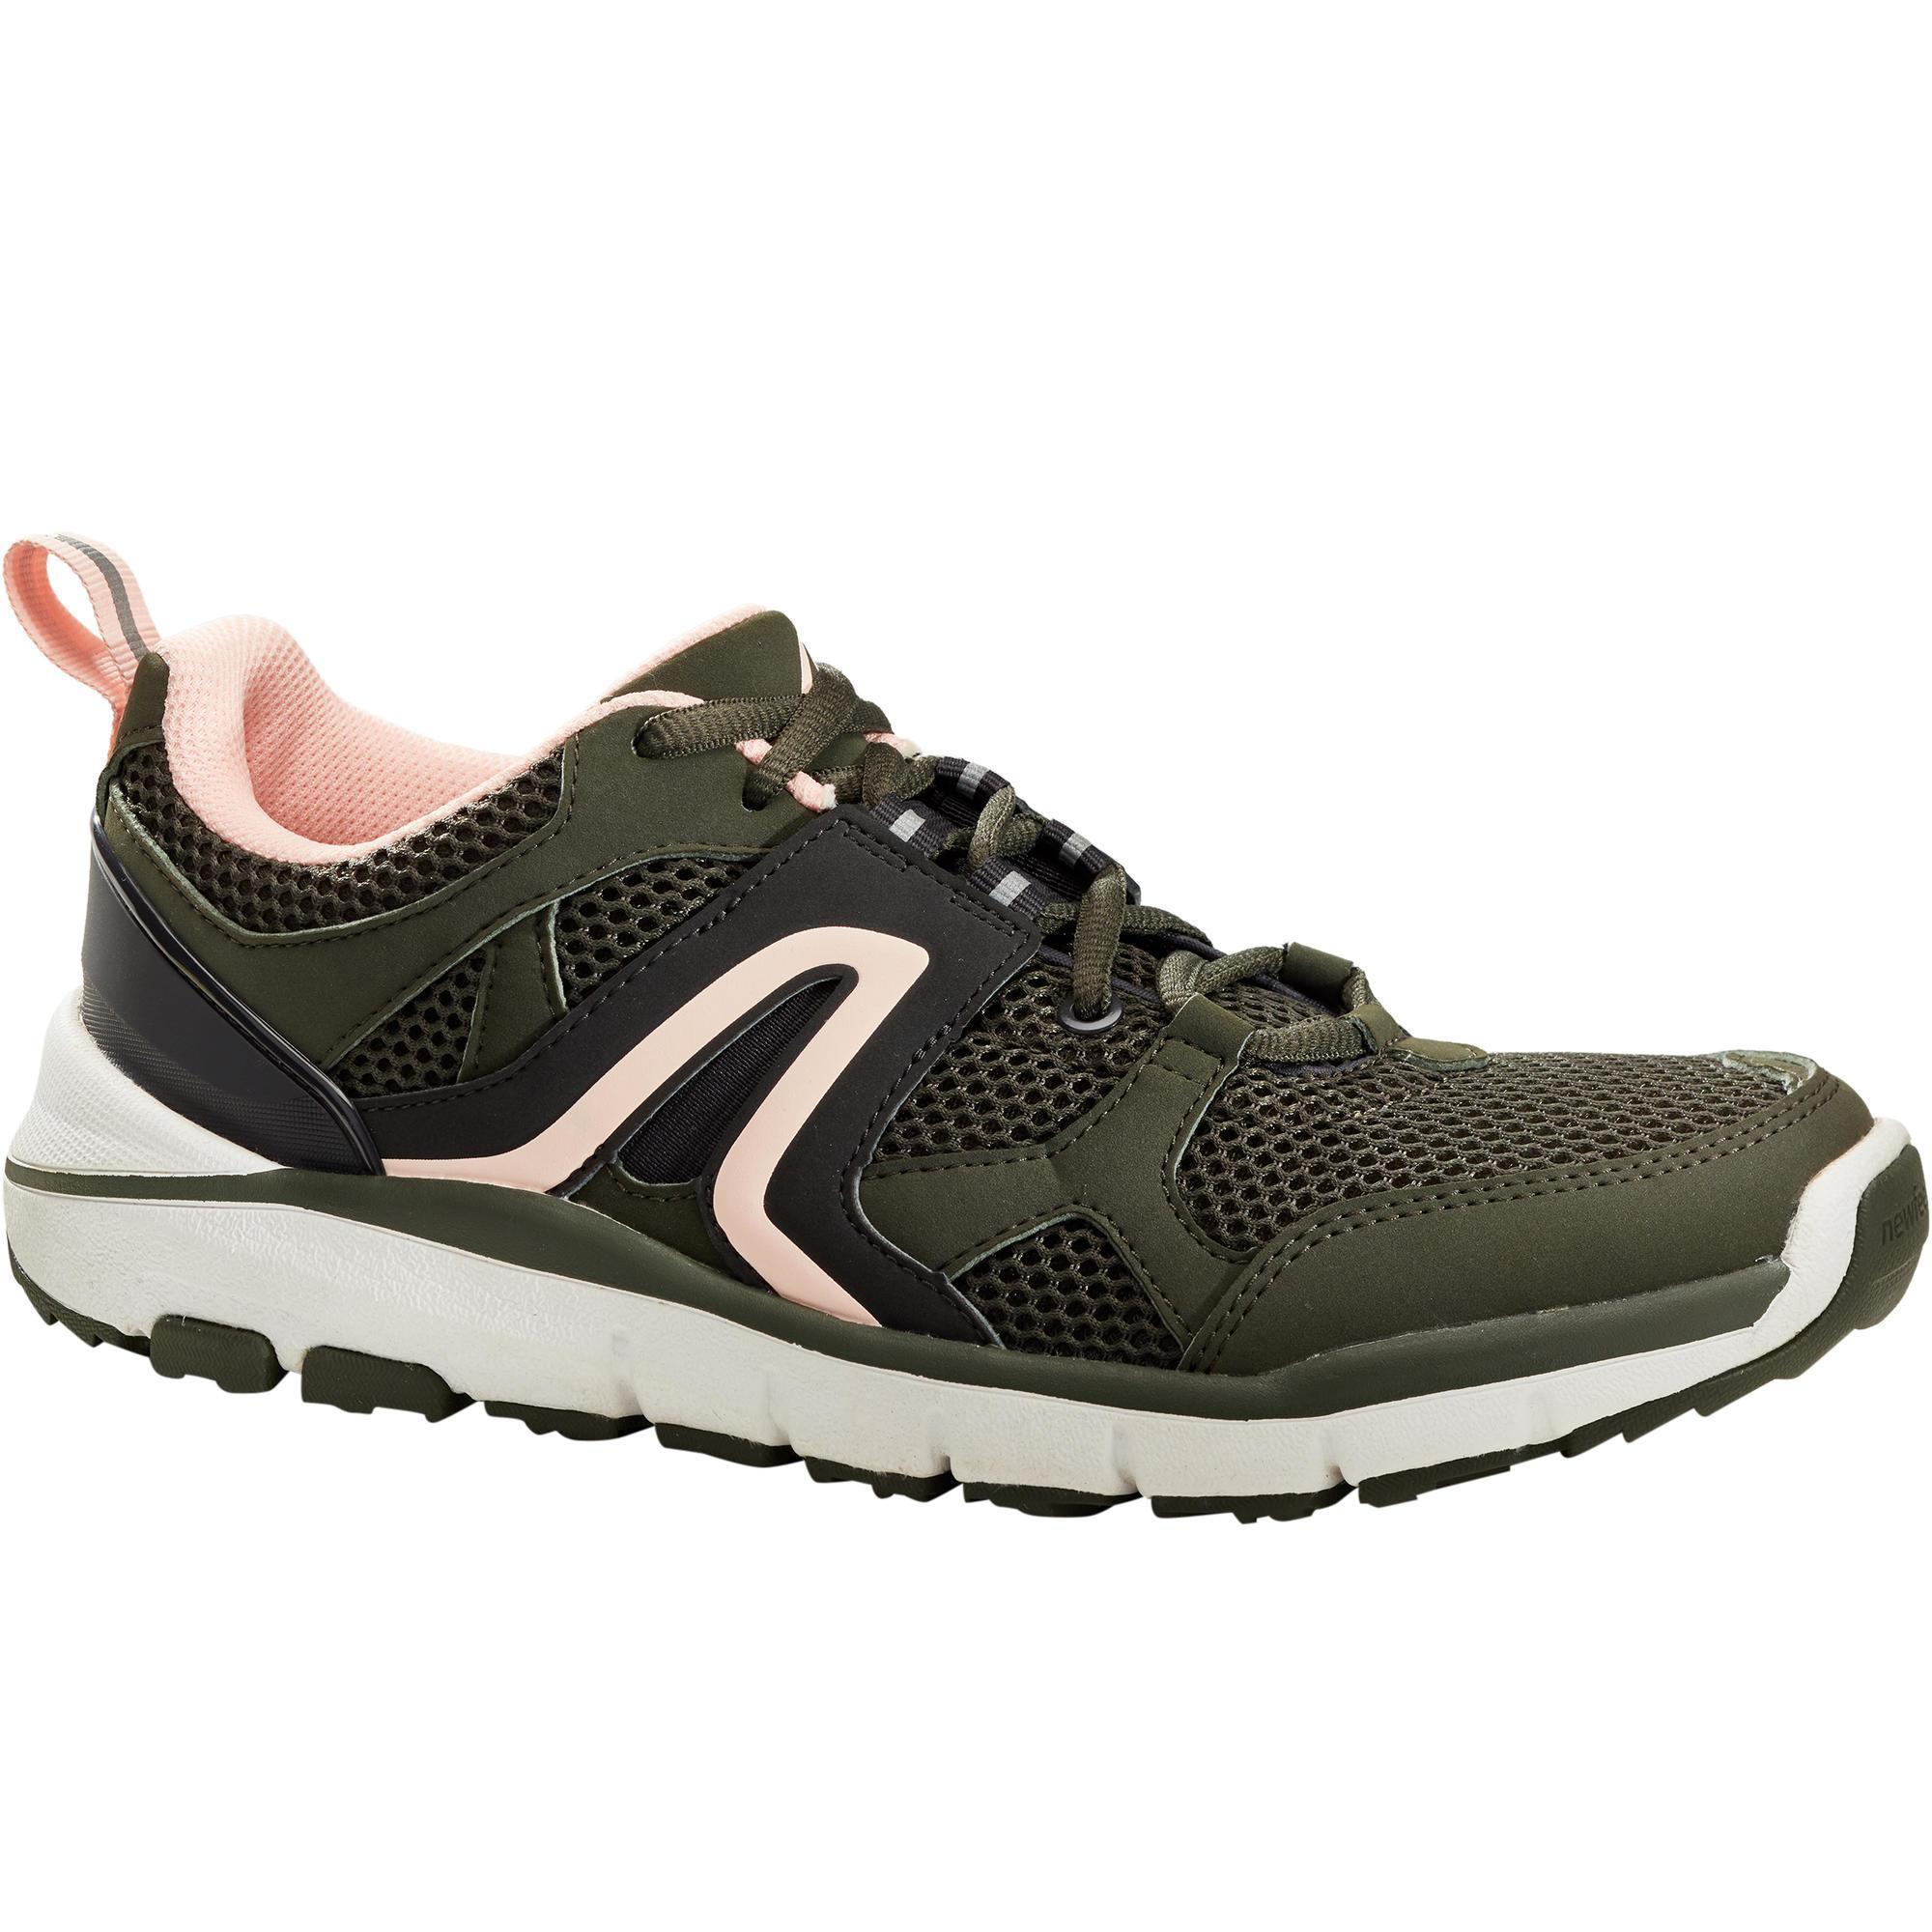 Walkingschuhe HW 500 Mesh Damen khaki | Schuhe > Sportschuhe > Walkingschuhe | Grün - Khaki - Rosa - Grau | Newfeel